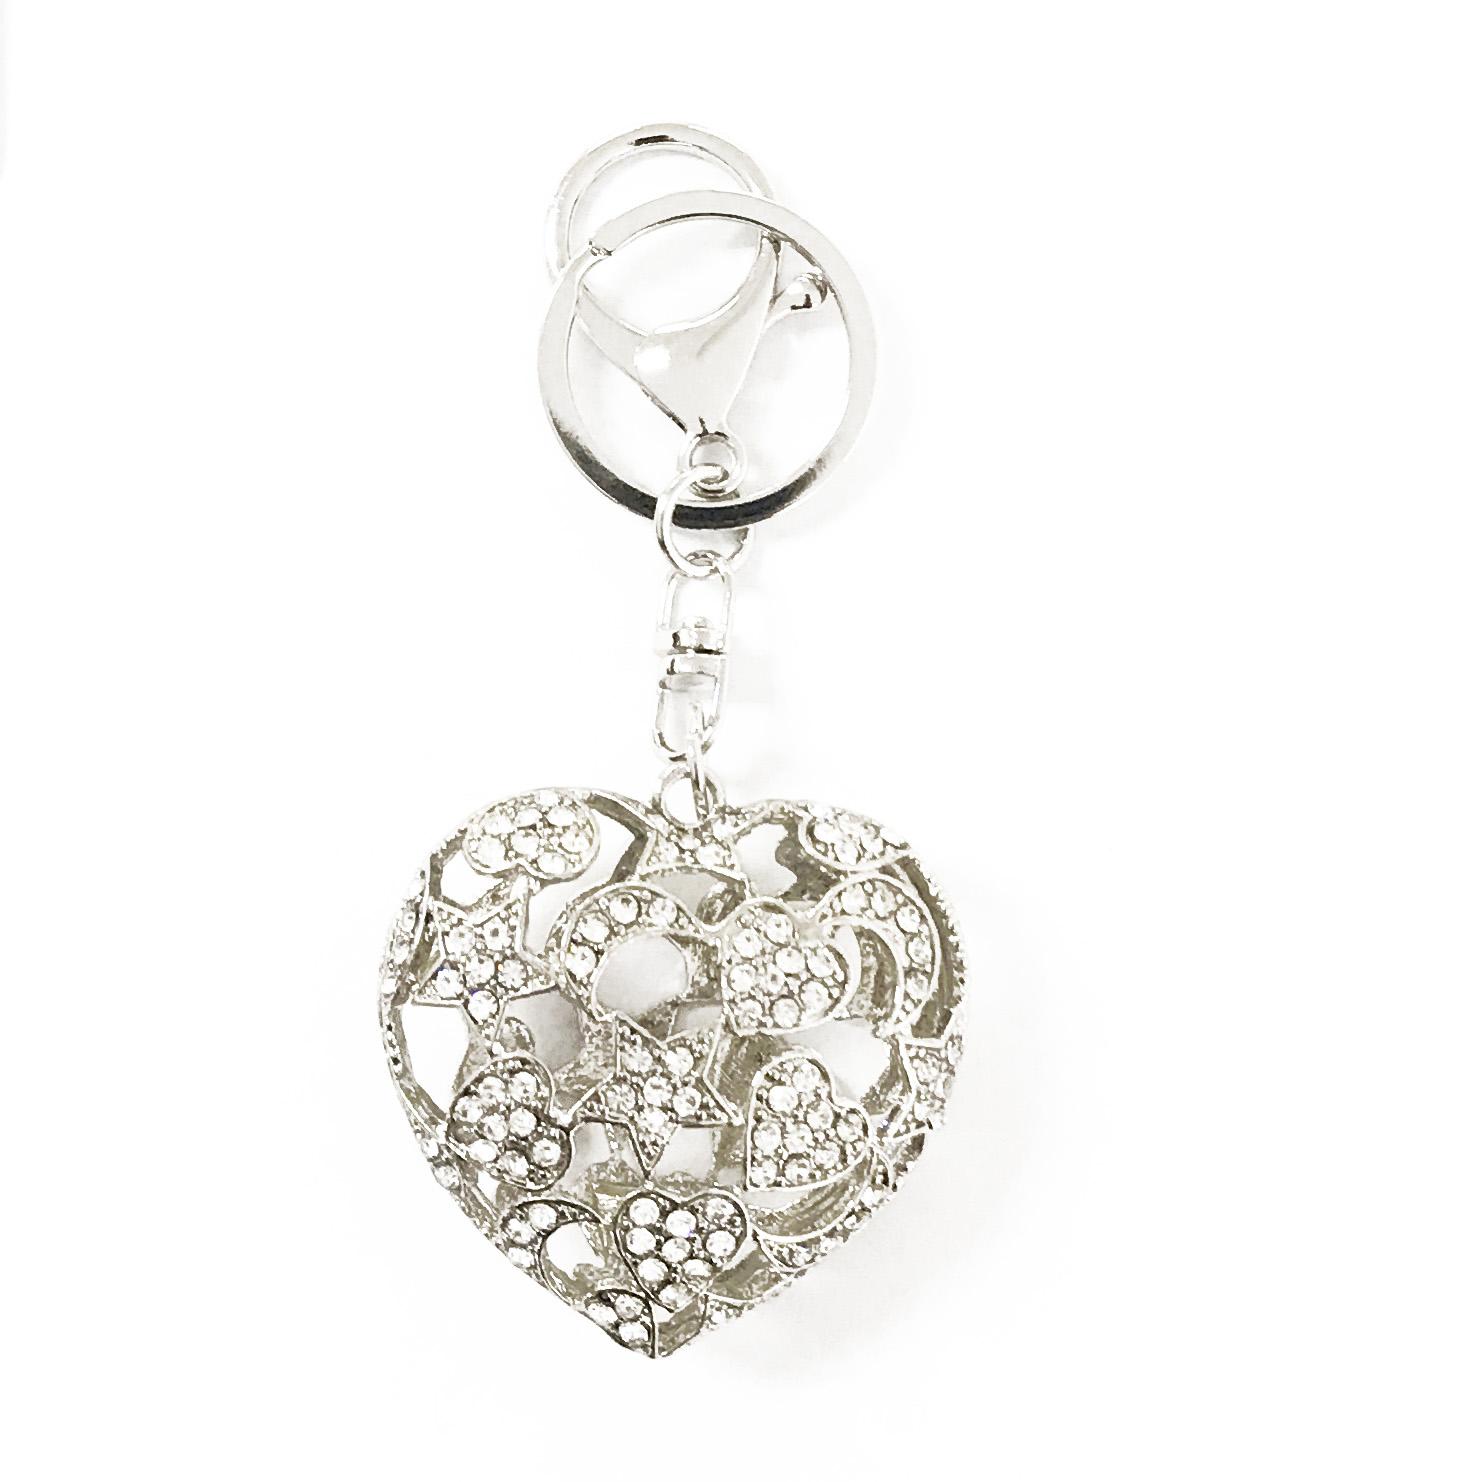 heart key chain and bag charm